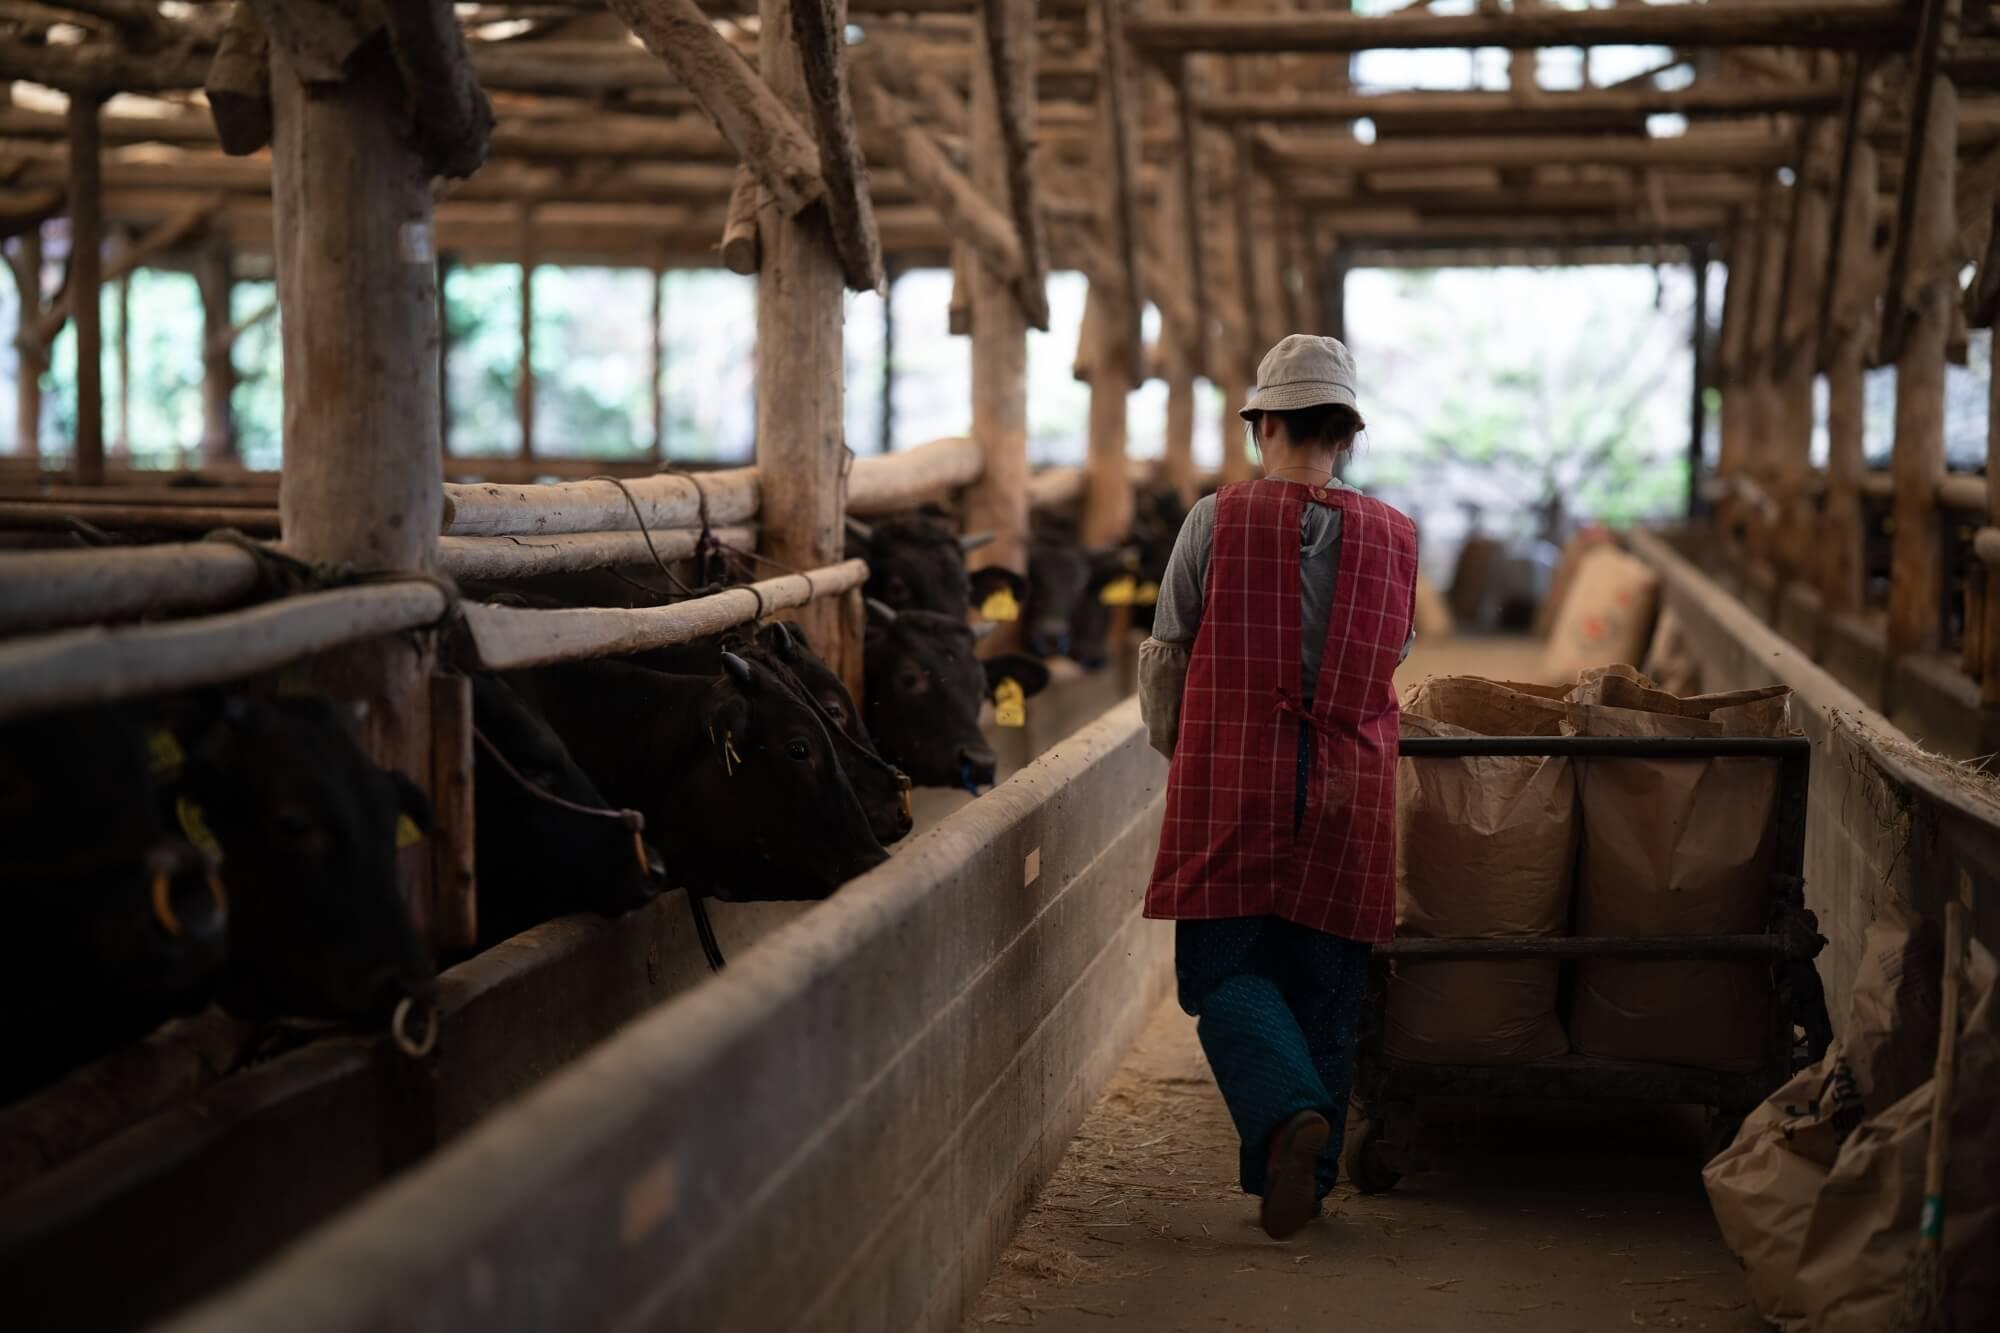 塚本畜産・牛舎小屋の風景1